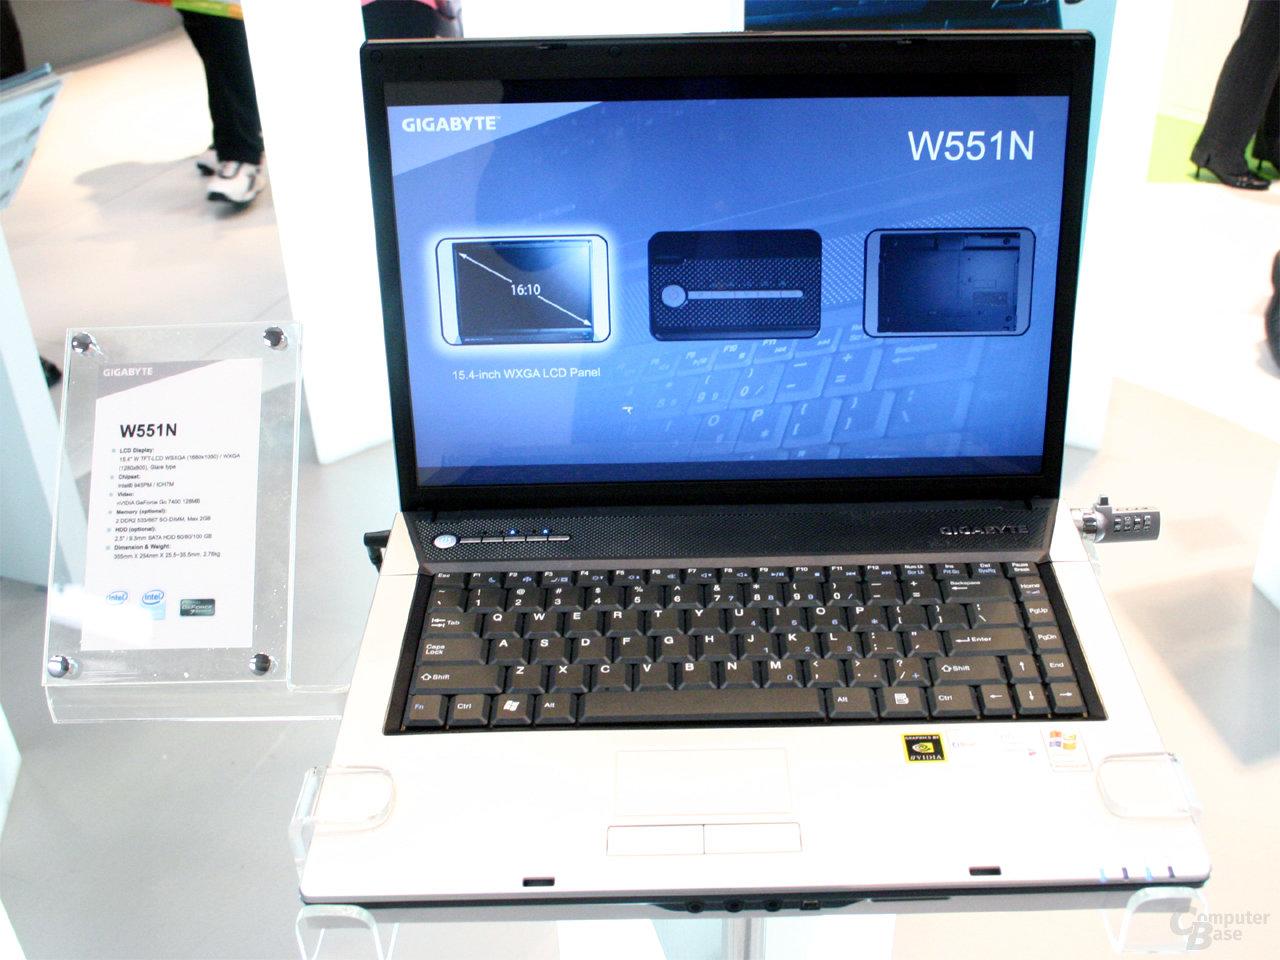 Gigabyte W551N Notebook